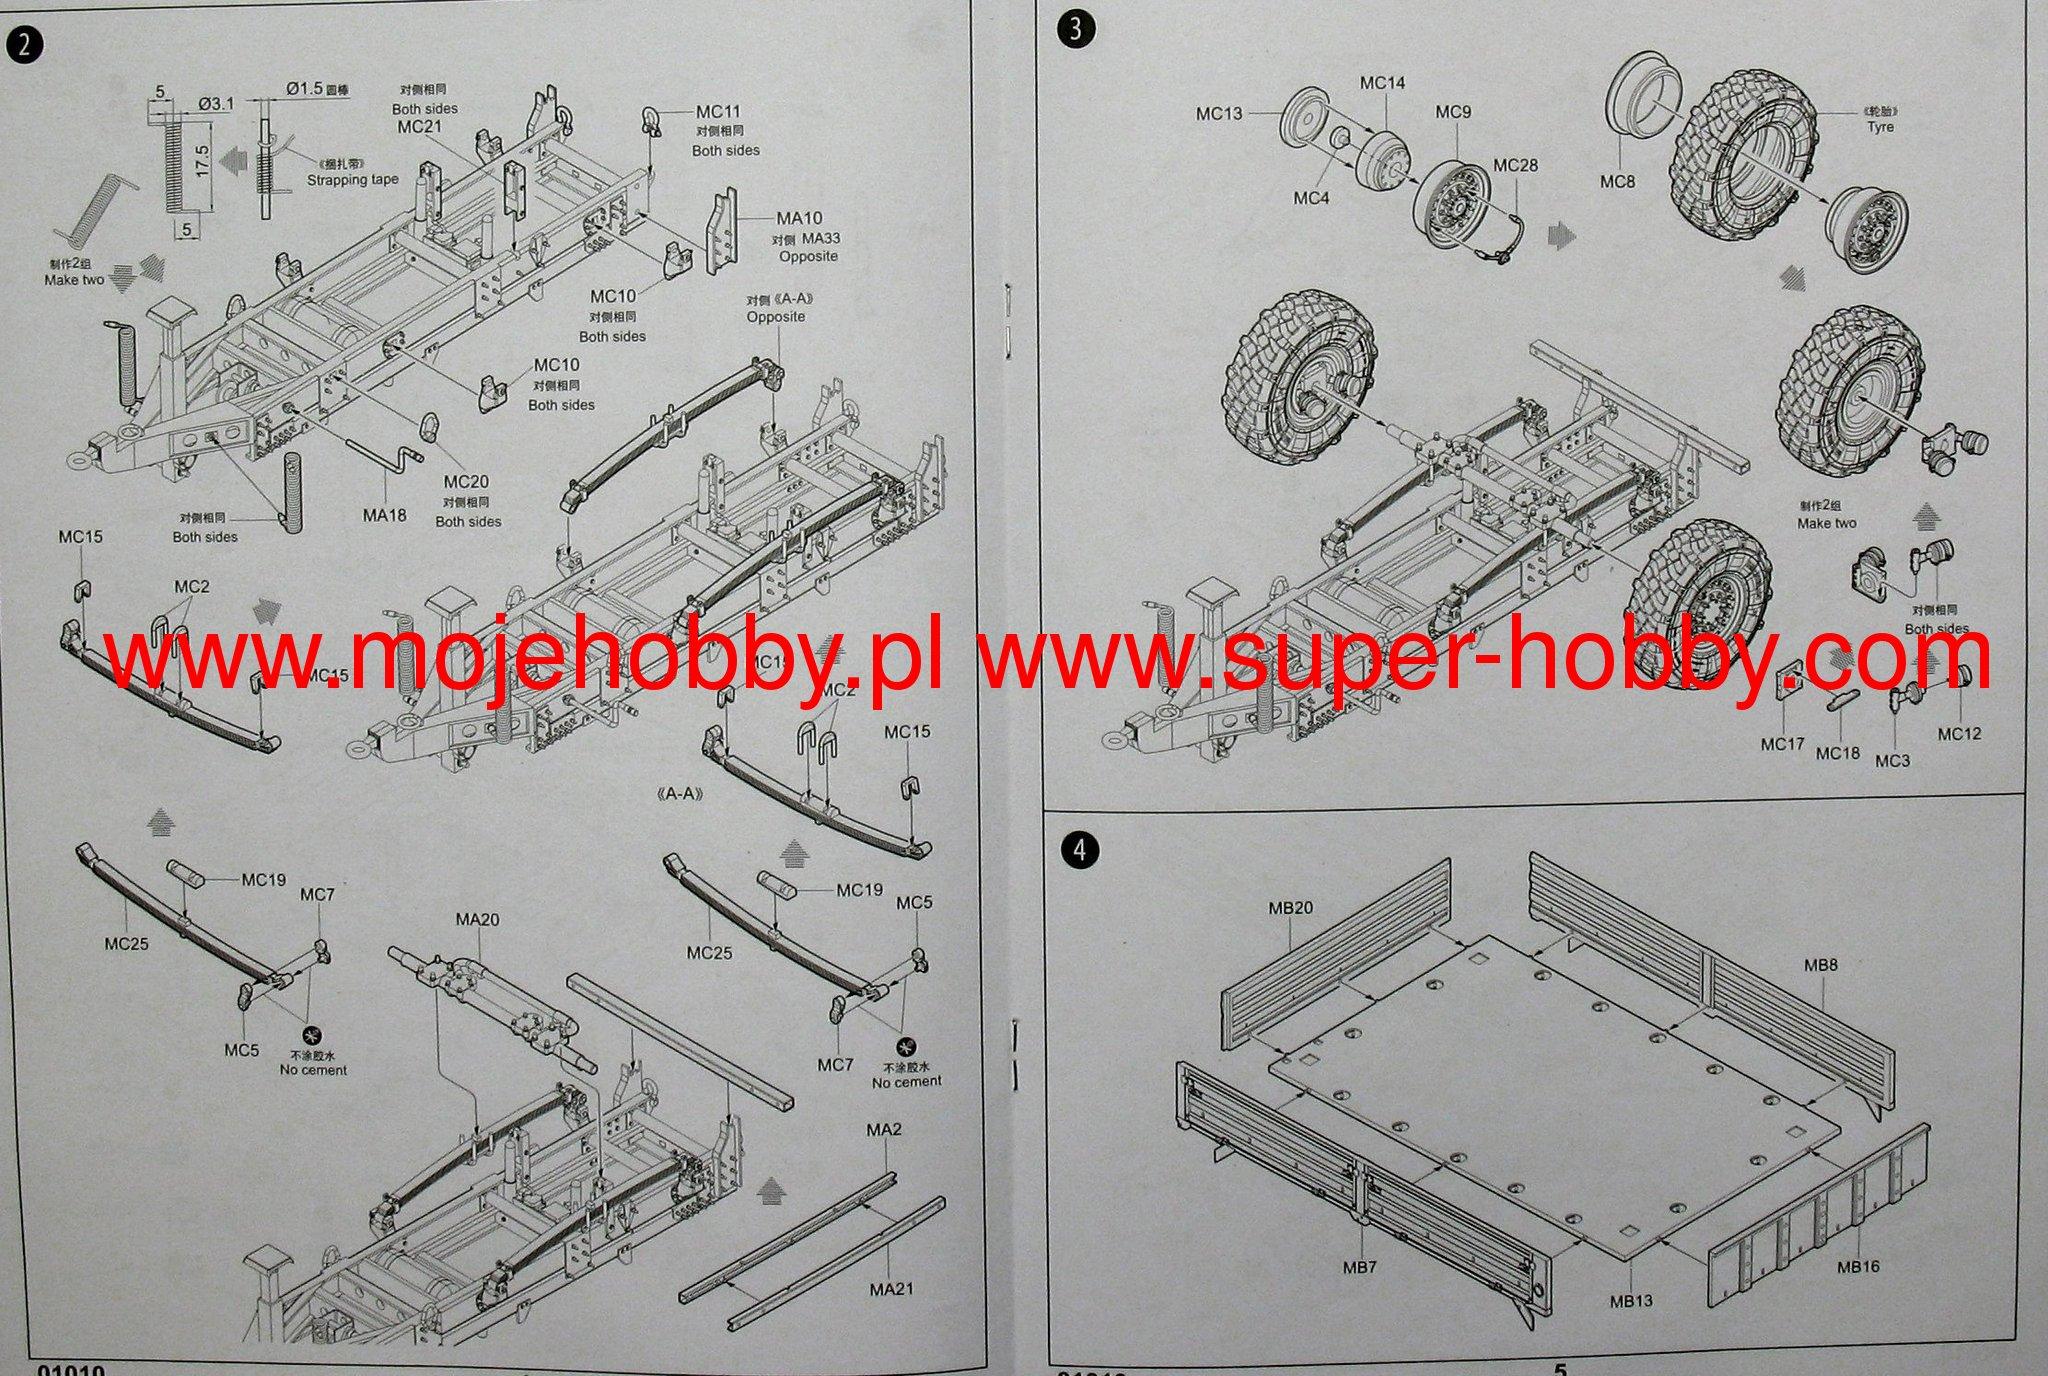 6397_2_tru01010_3 m1082 lmtv trailer trumpeter 01010 lmtv wiring diagram at downloadfilm.co